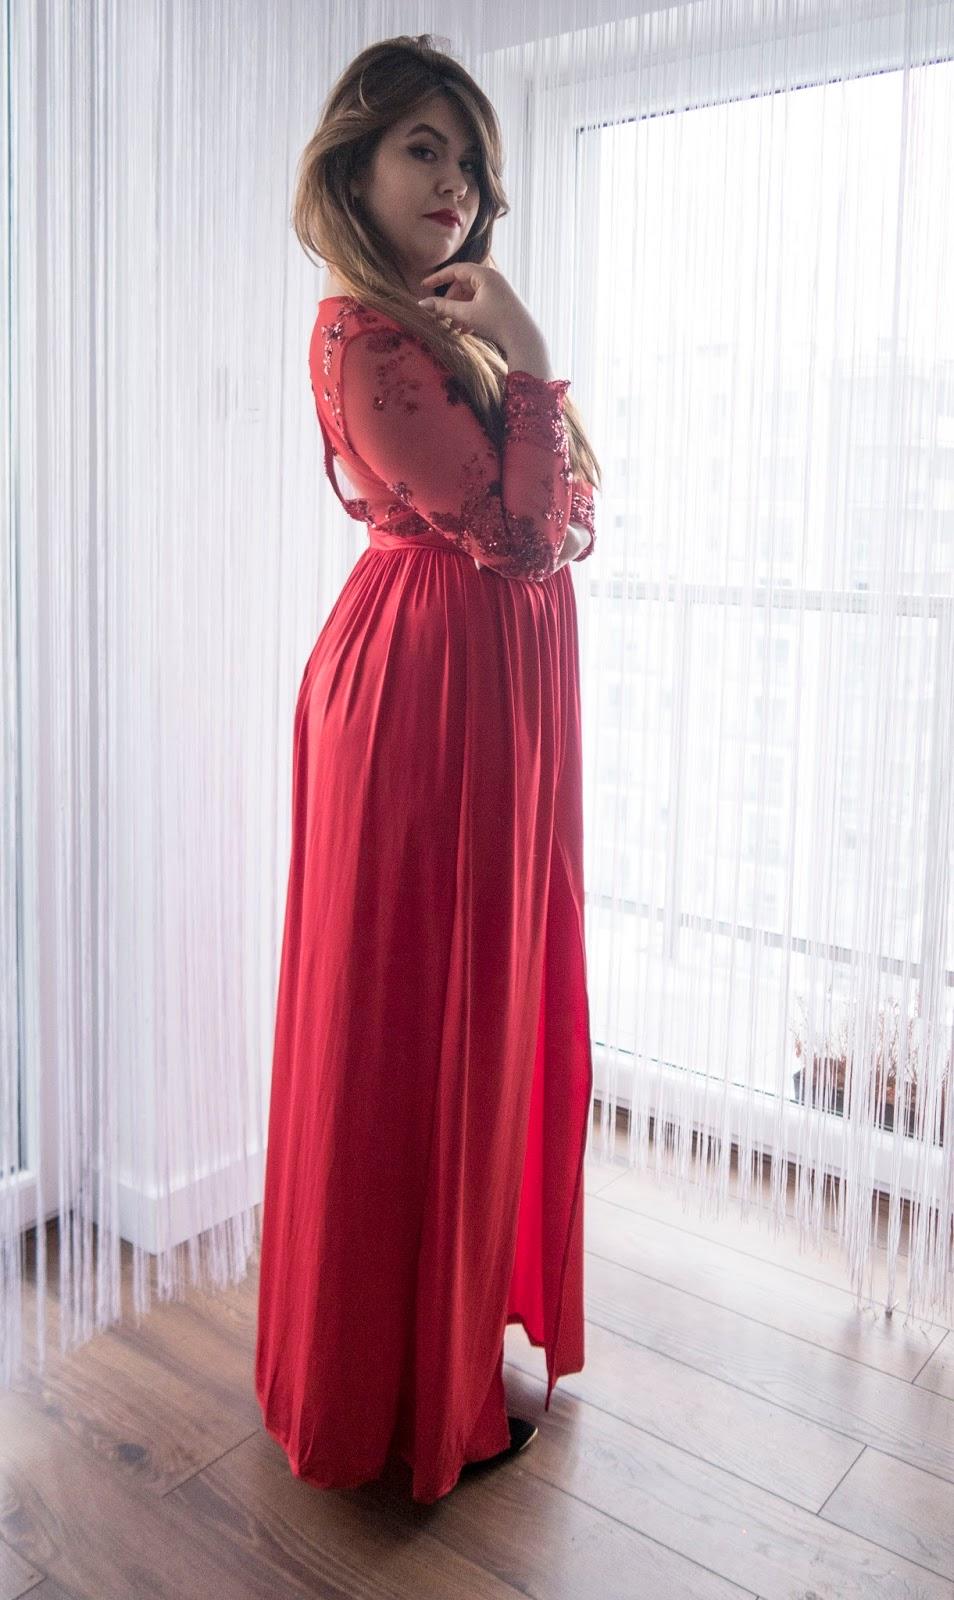 584c088c9f Tania sukienka wesele 2018. Czerwona Sukienka